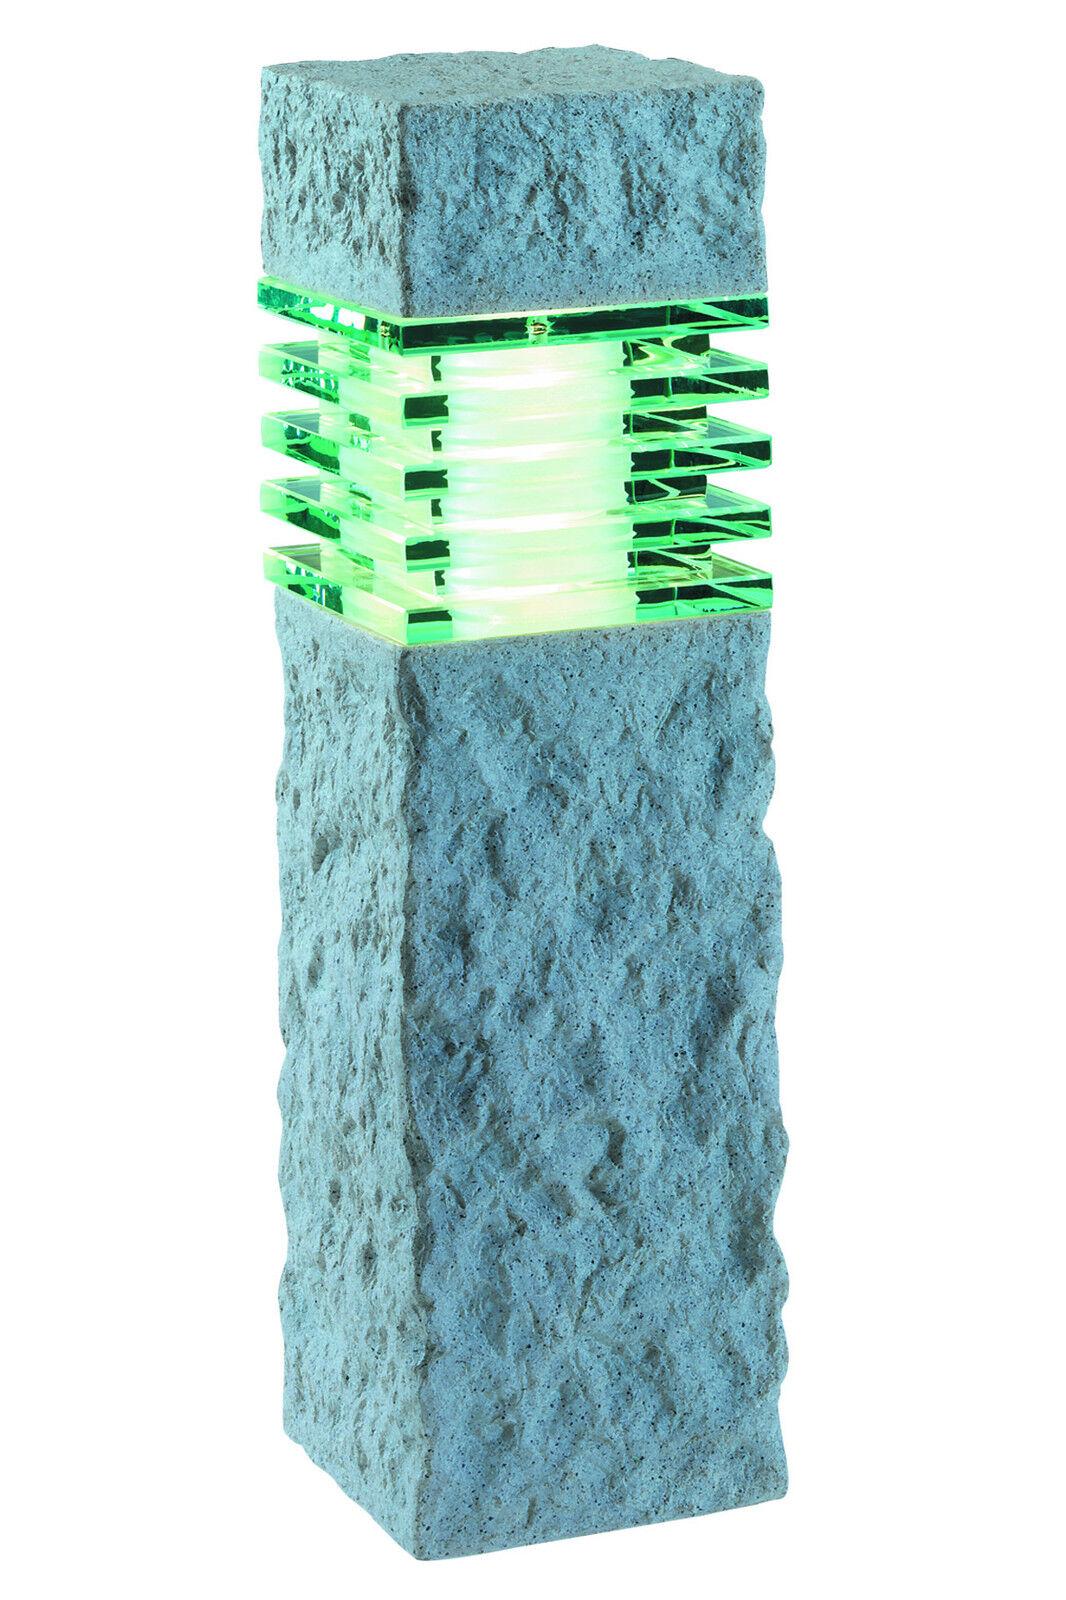 Gardenlights lámpara de jardín 12 voltios Nepos piedra efecto LED 3w calido-Weiss